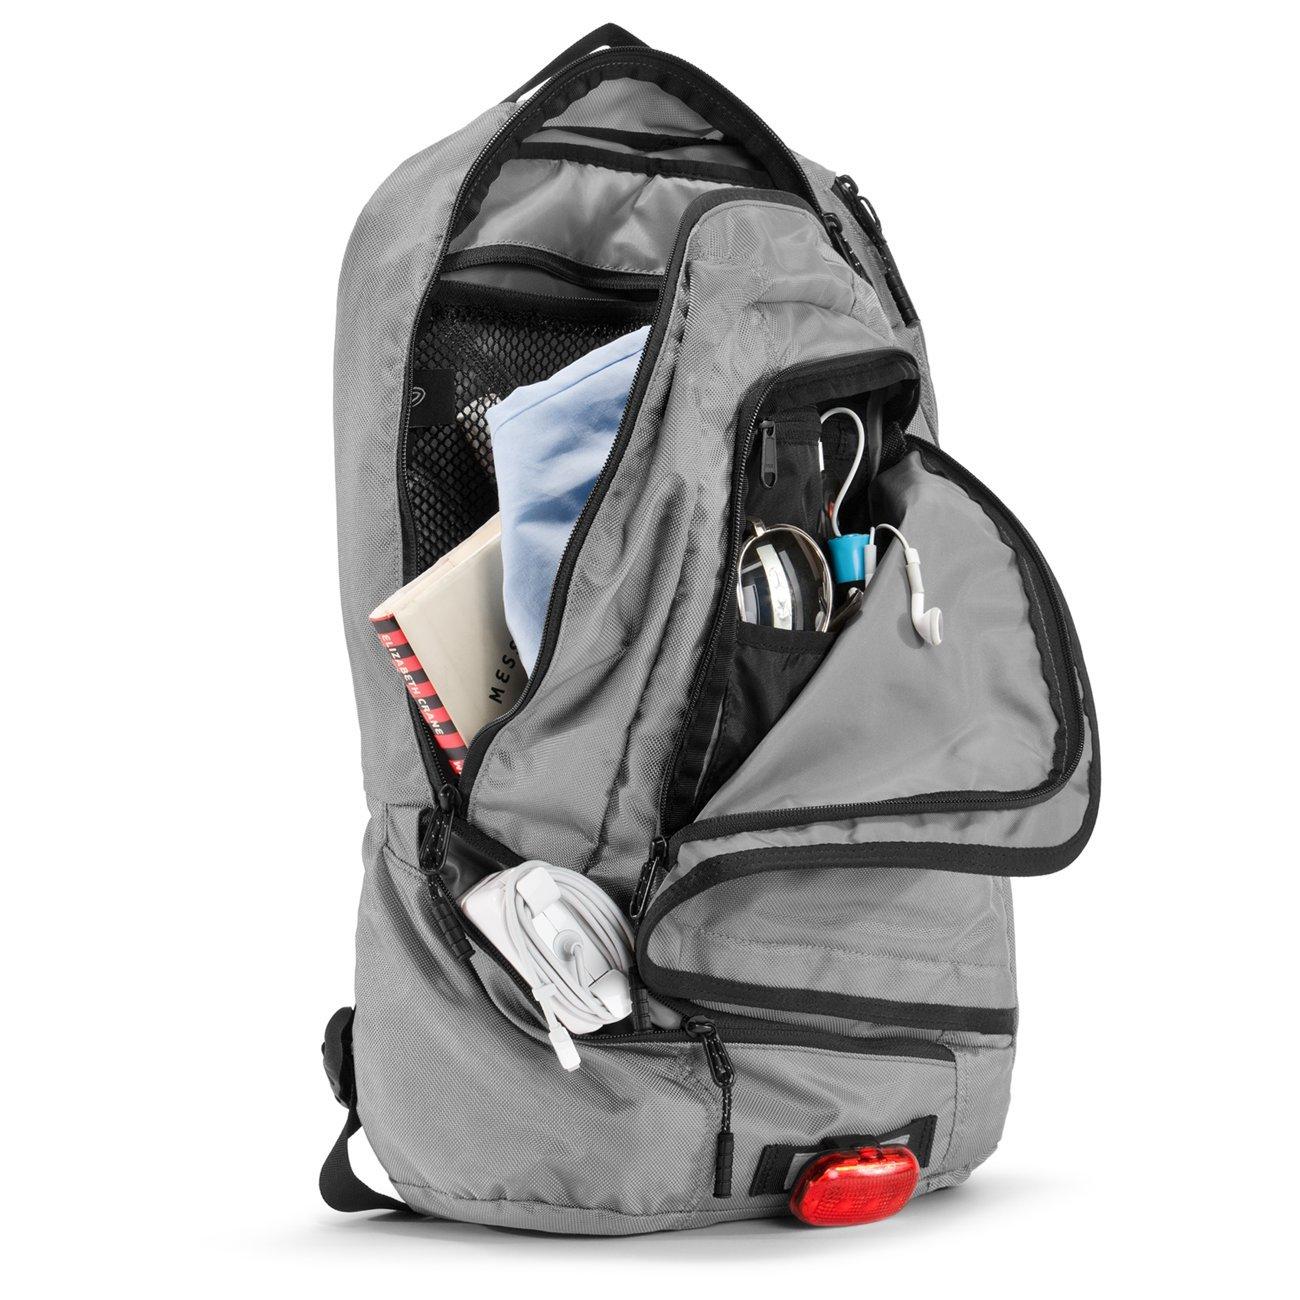 Timbuk2 Casual Daypack 382-4-2208 Q Backpack Medium 26 Liters Multicolour ( Grey/ Yellow/ Black) 82803: Amazon.co.uk: Luggage